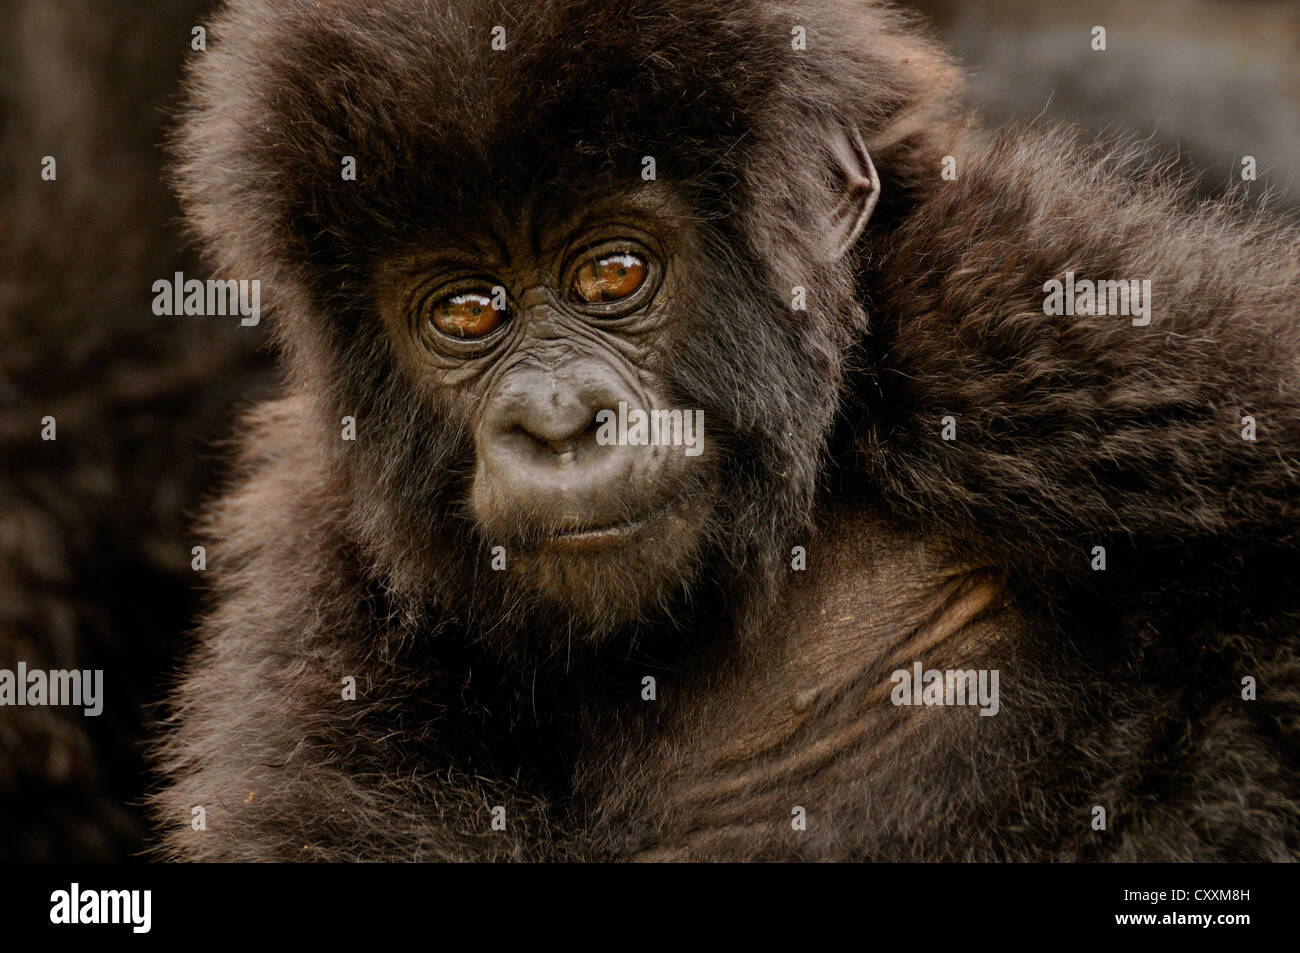 Baby Gorilla di Montagna (Gorilla beringei beringei) dal gruppo Hirwa ai piedi del vulcano Gahinga Immagini Stock